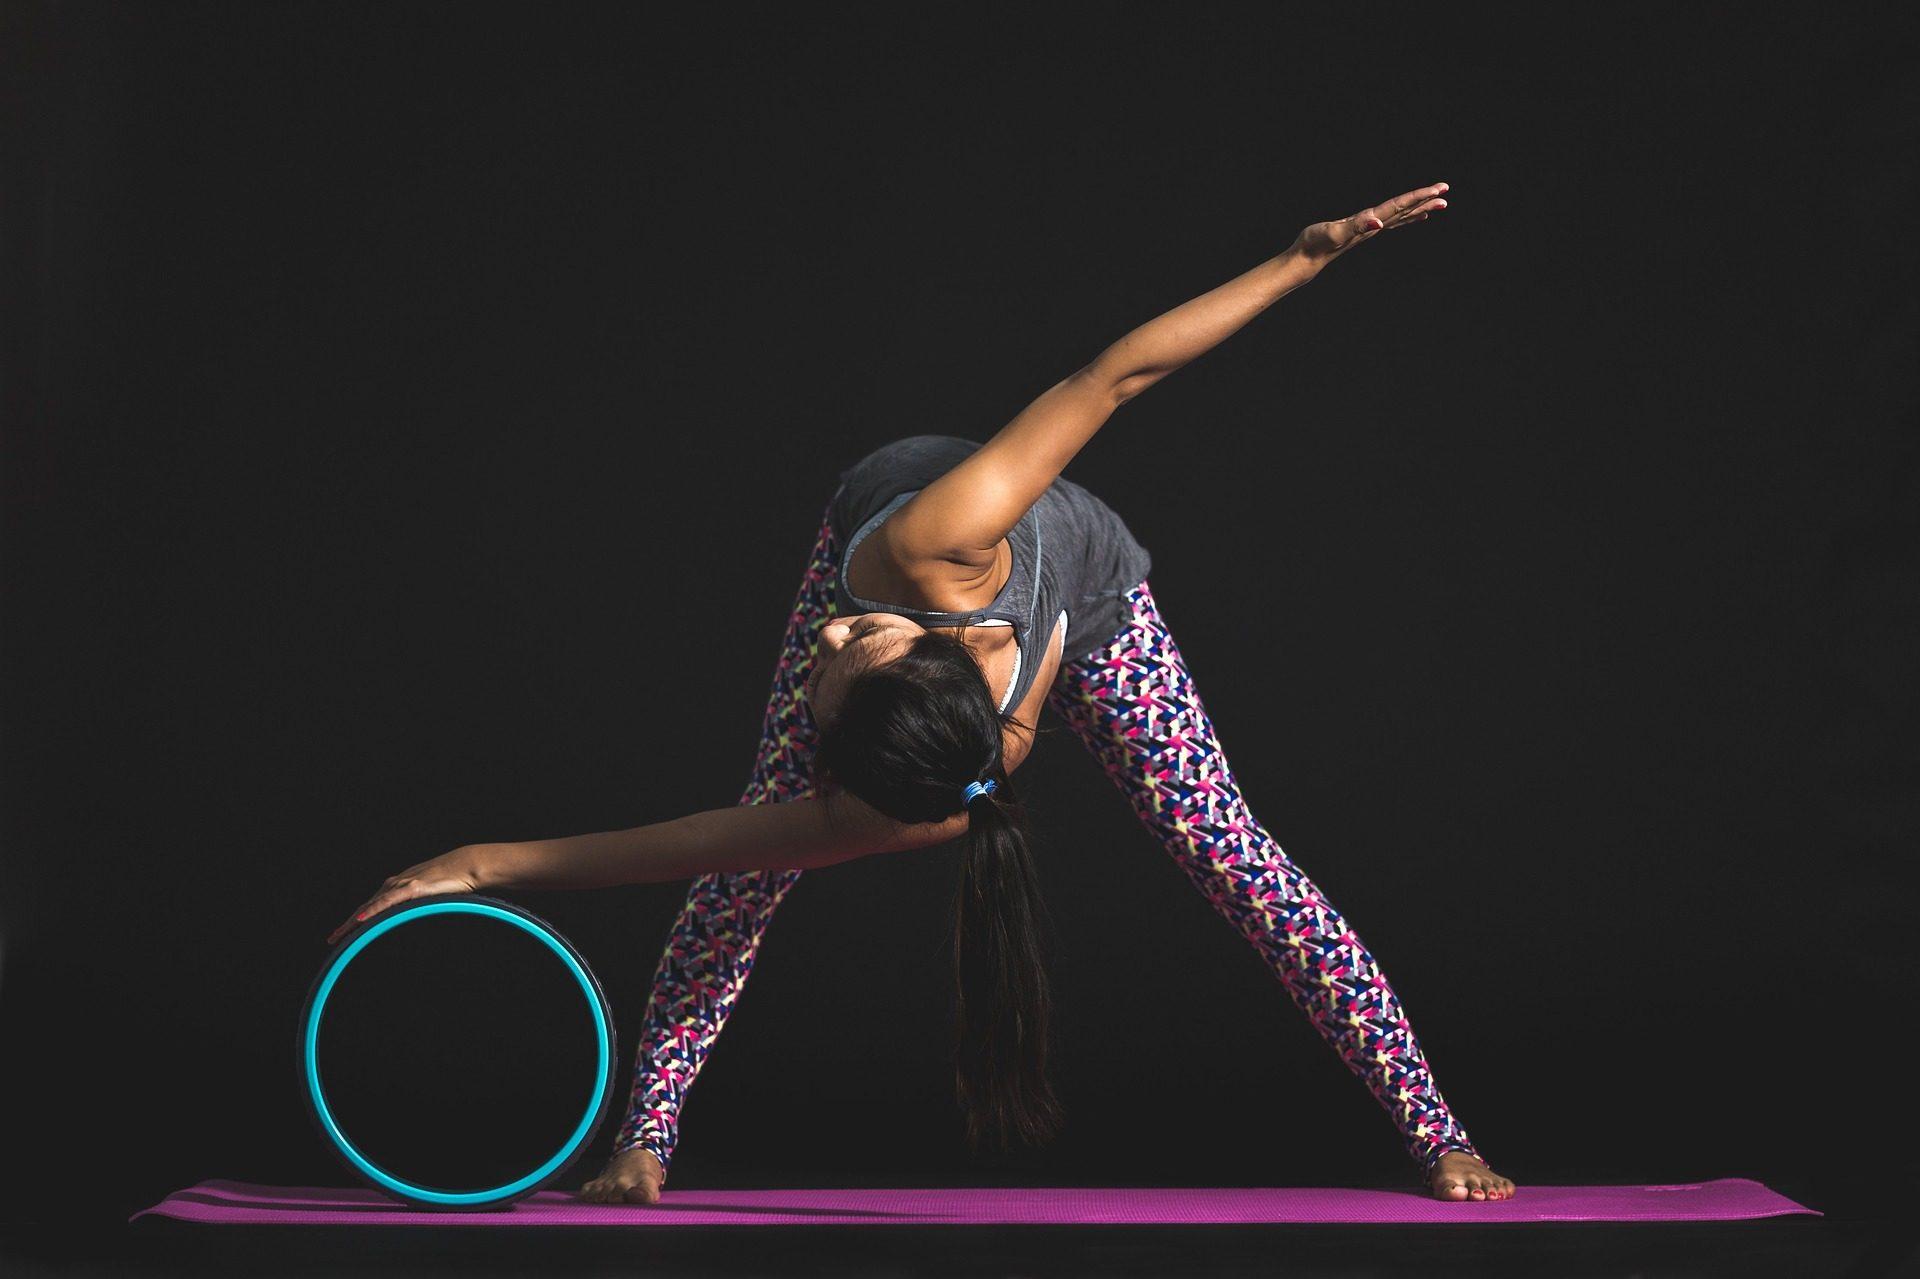 महिला, व्यायाम, खेल, योग, आसन - HD वॉलपेपर - प्रोफेसर-falken.com